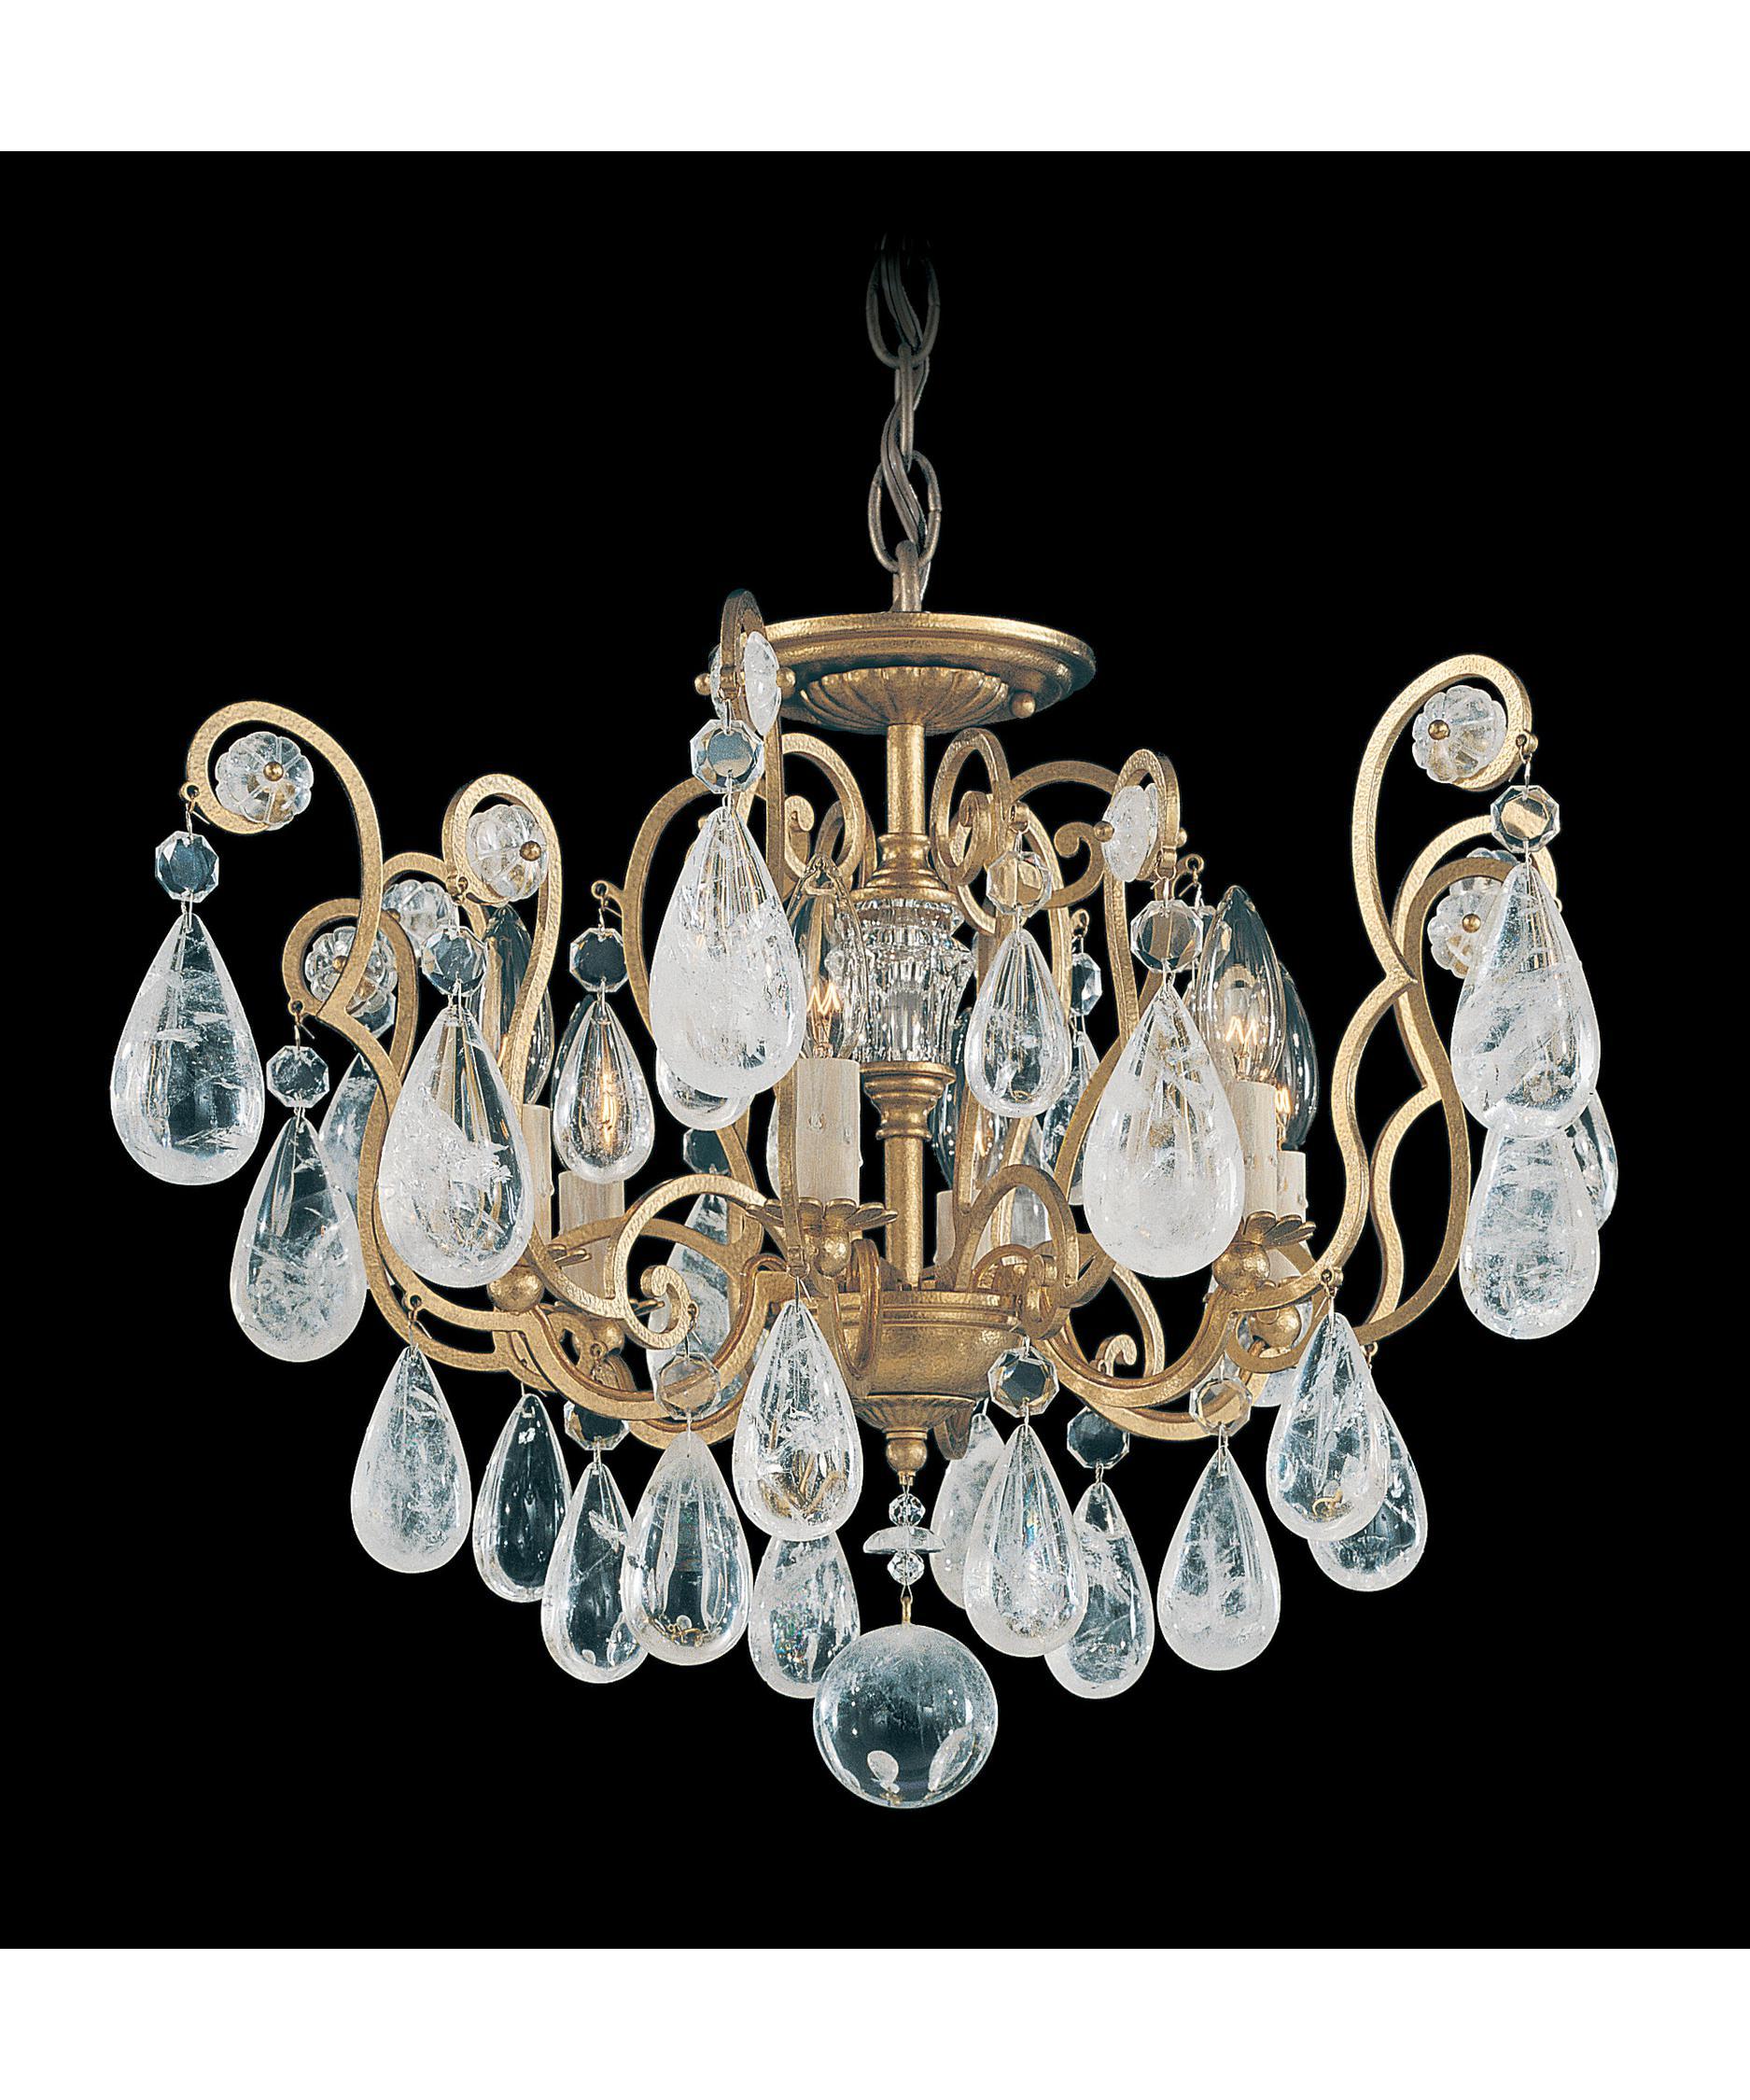 Crystal Semi Flush Mount Lighting: Shown in Heirloom Gold finish and Rock crystal,Lighting